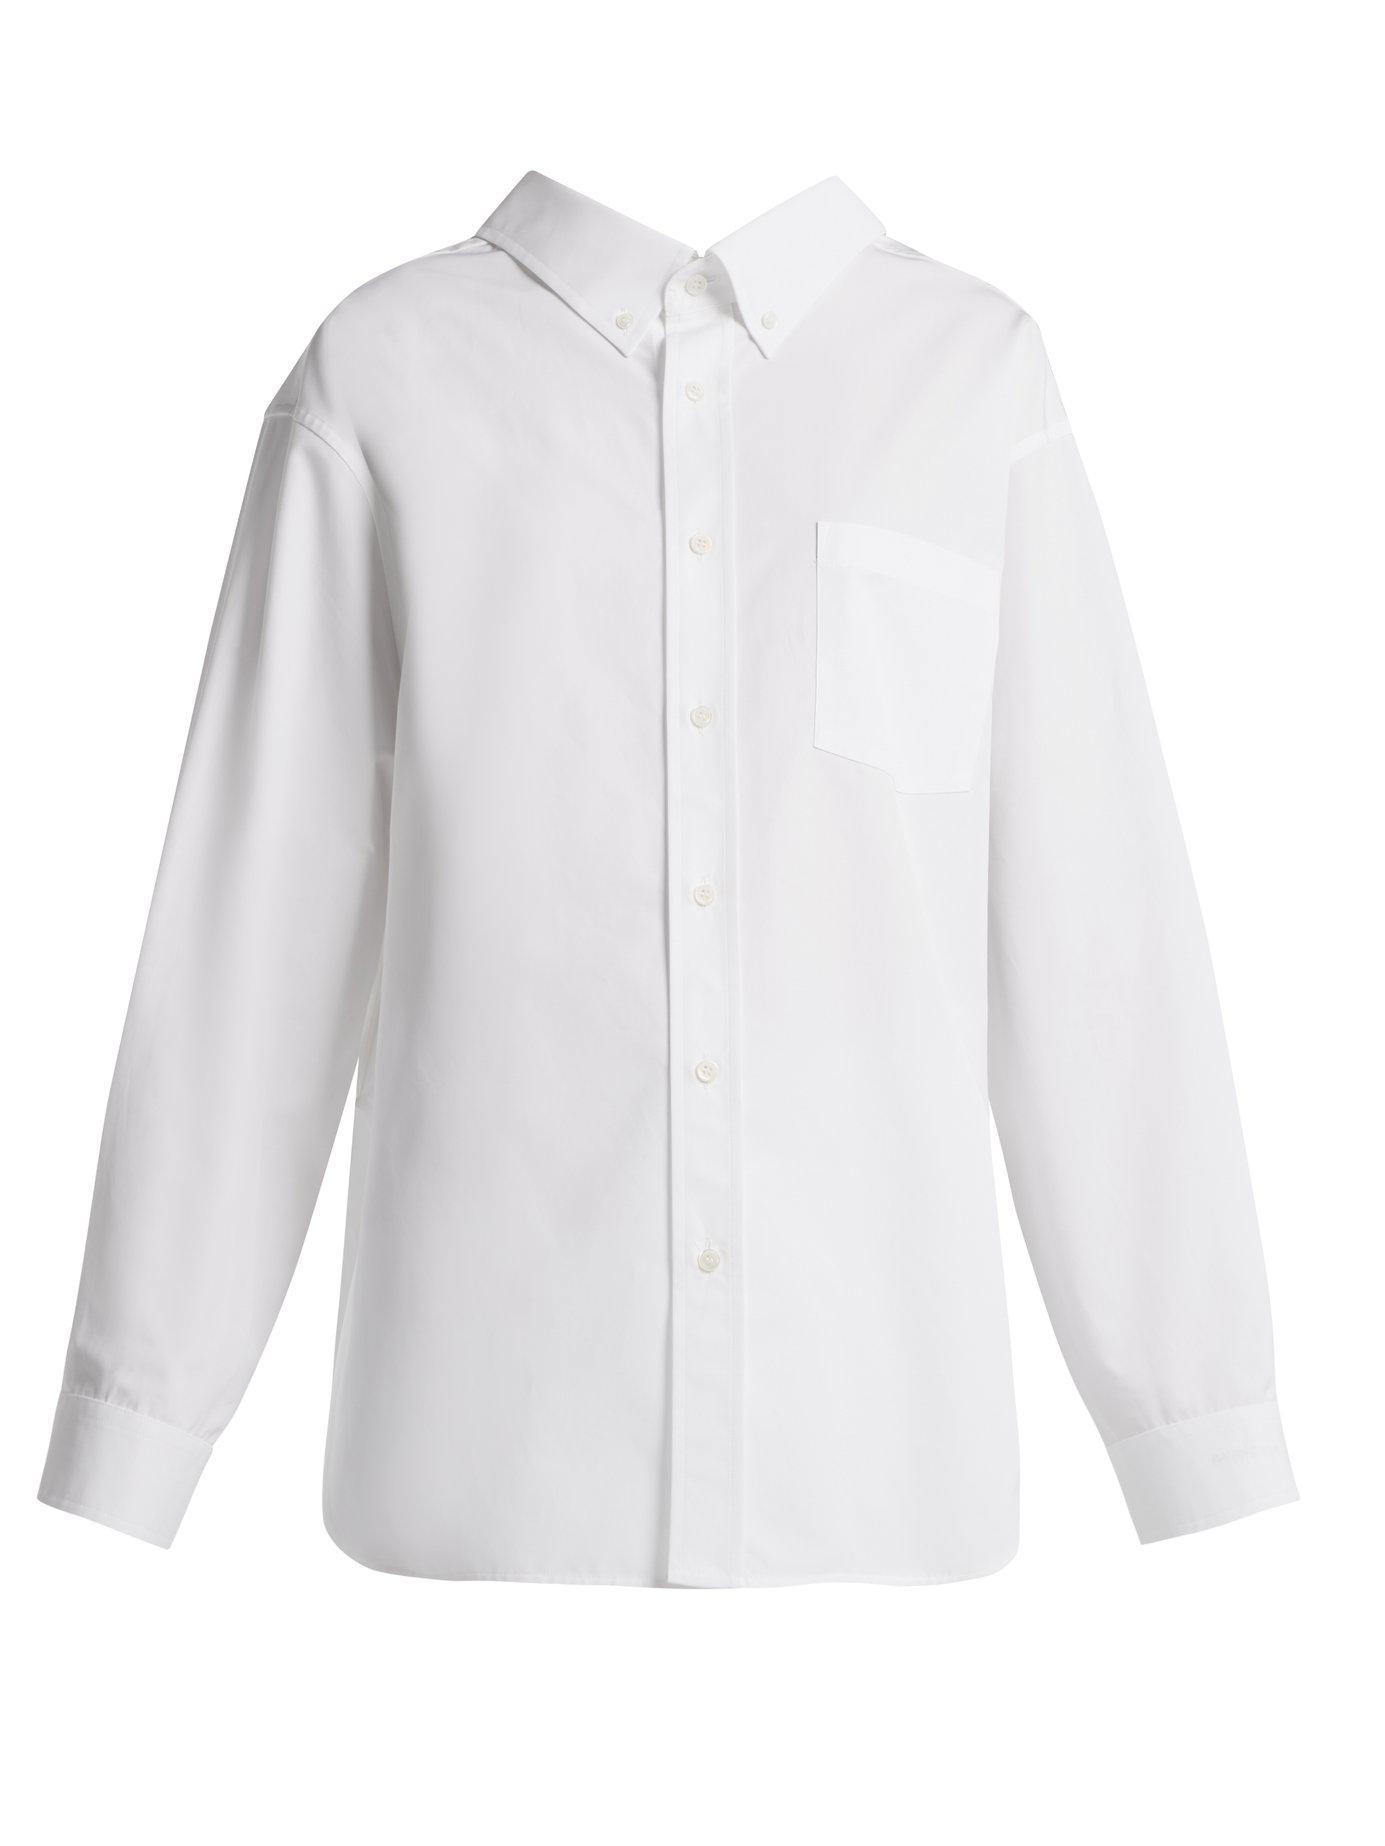 32ad90c208a5ab Lyst - Balenciaga Swing Cotton Shirt in White